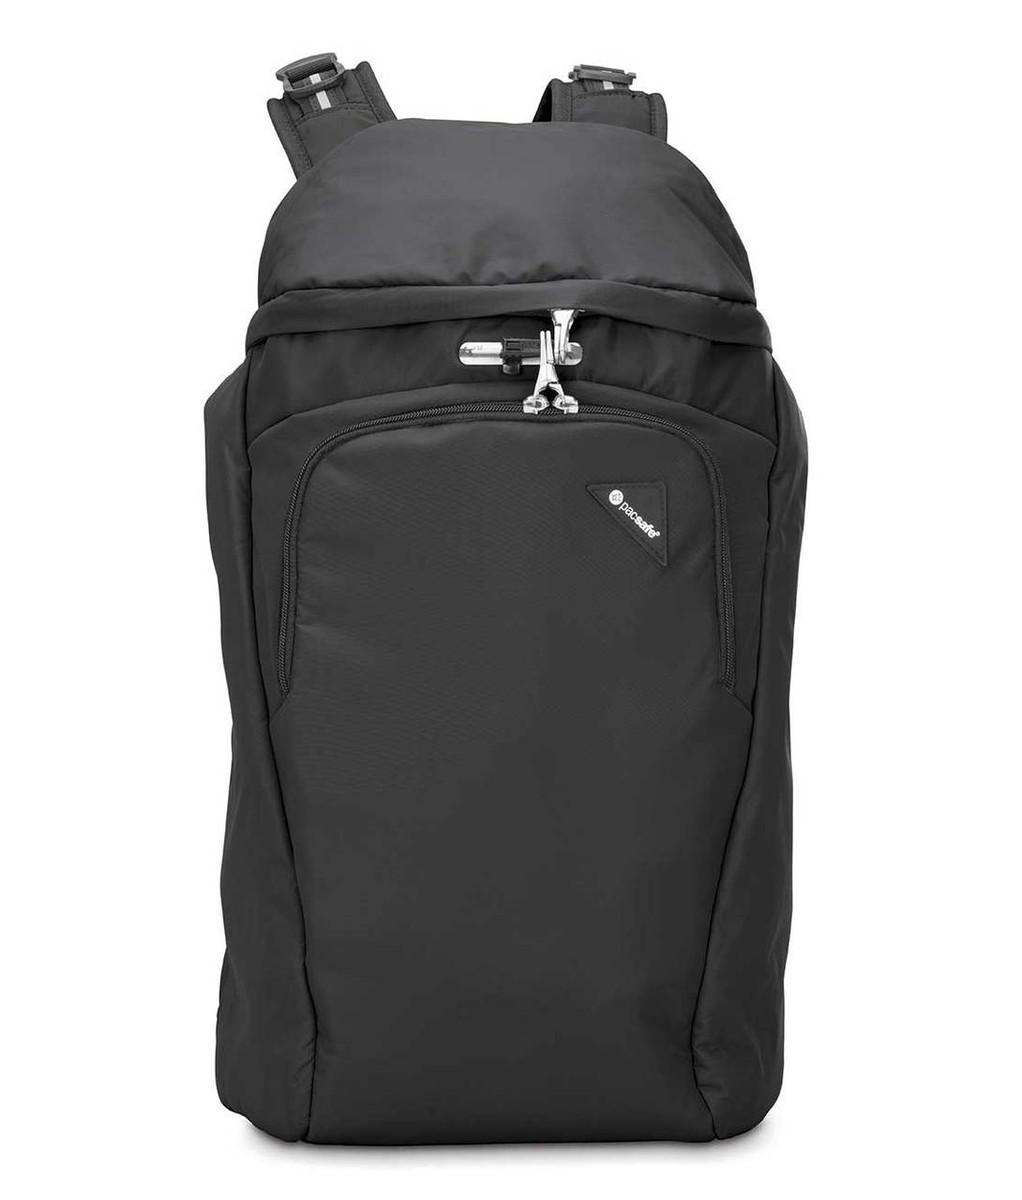 Pacsafe Vibe 30 backpack, black